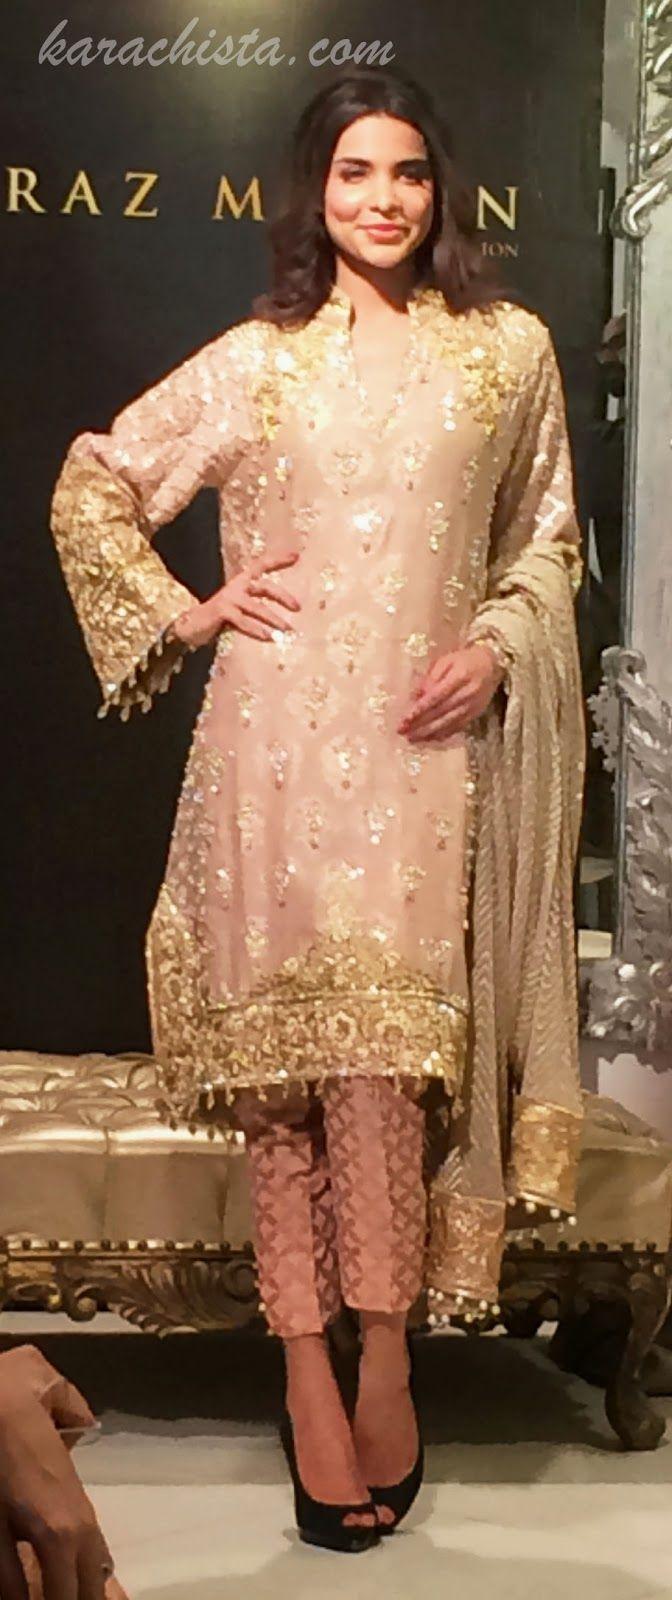 Shirt design ideas pakistani - I M Kinda Feelin This Short Shirts Fashion Now Faraz Manan Collection